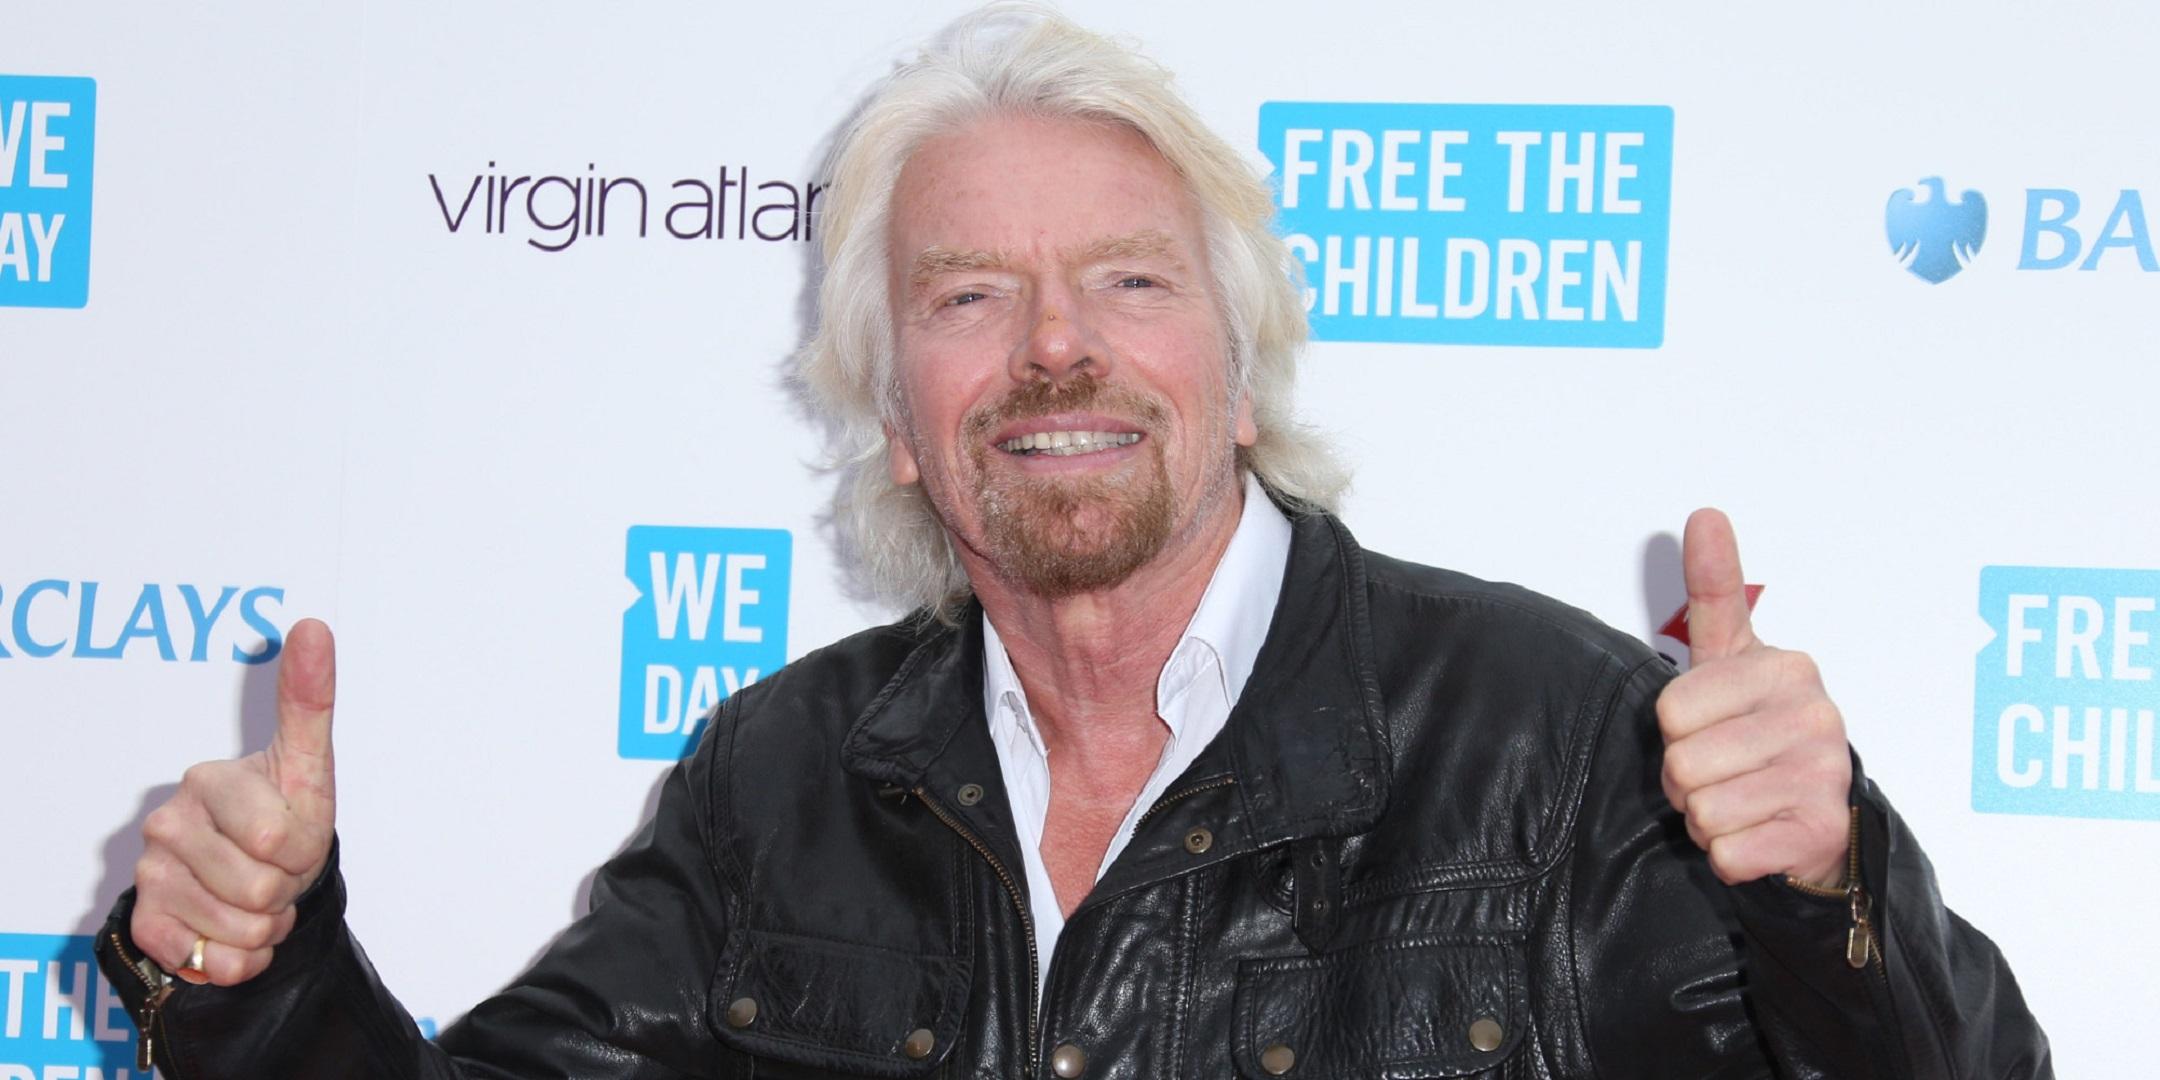 Richard Branson Hd Desktop